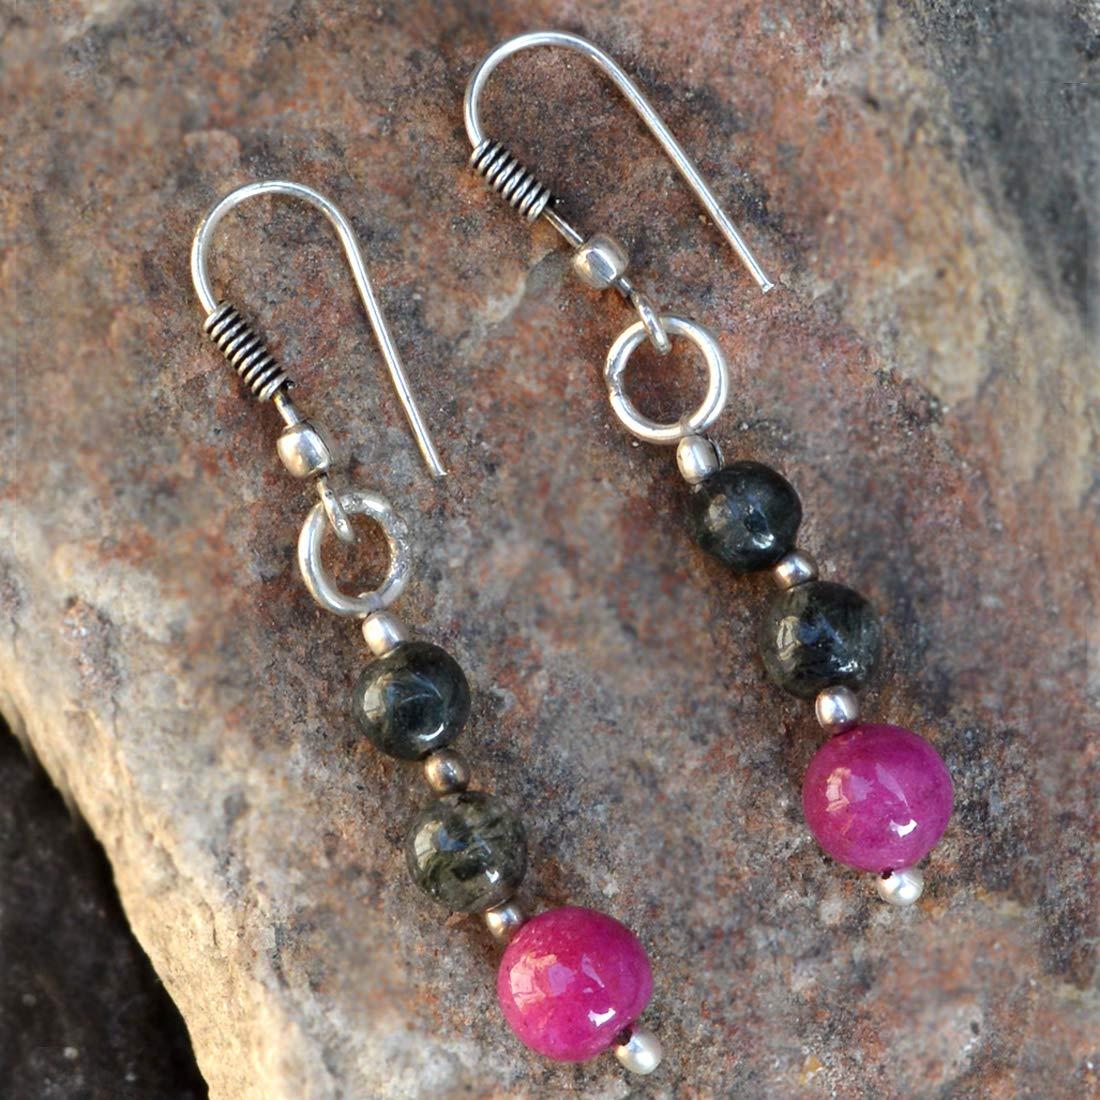 Saamarth Impex Pink Jade /& Rutile Quartz 925 Silver Plated Dangle Earring PG-131975